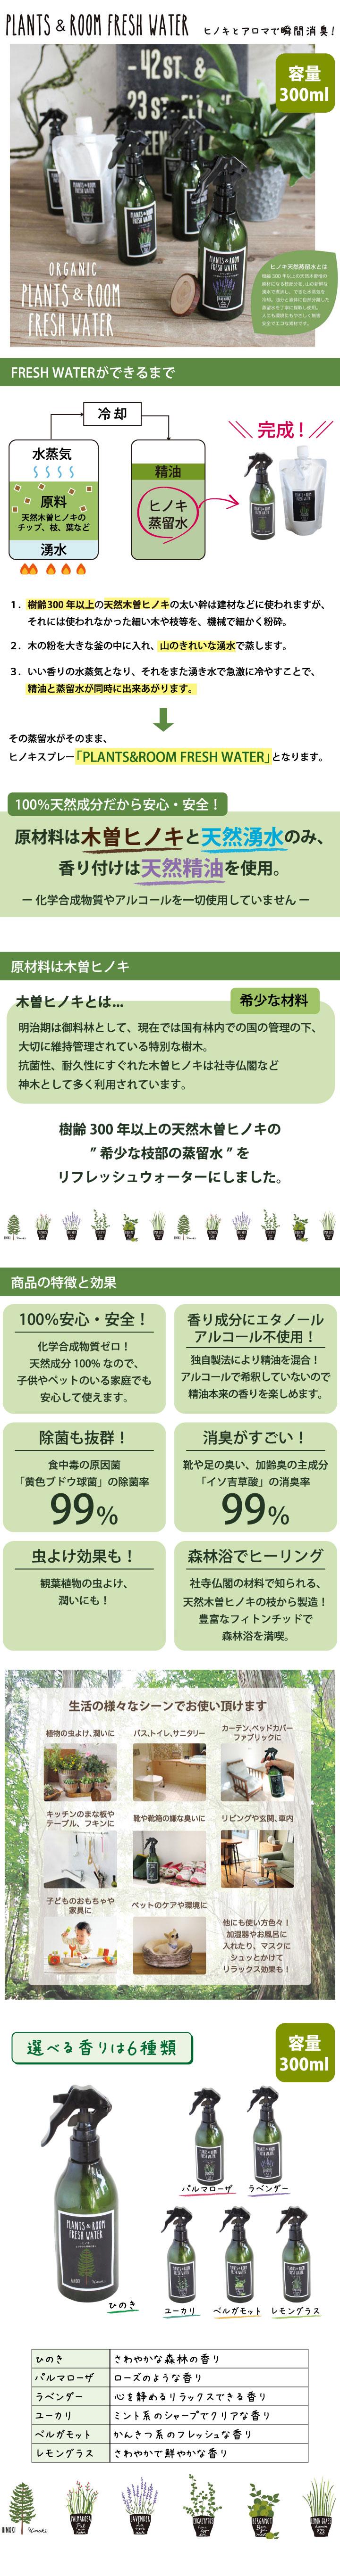 【50612ar】天然成分100%ヒノキ水除菌消臭スプレー